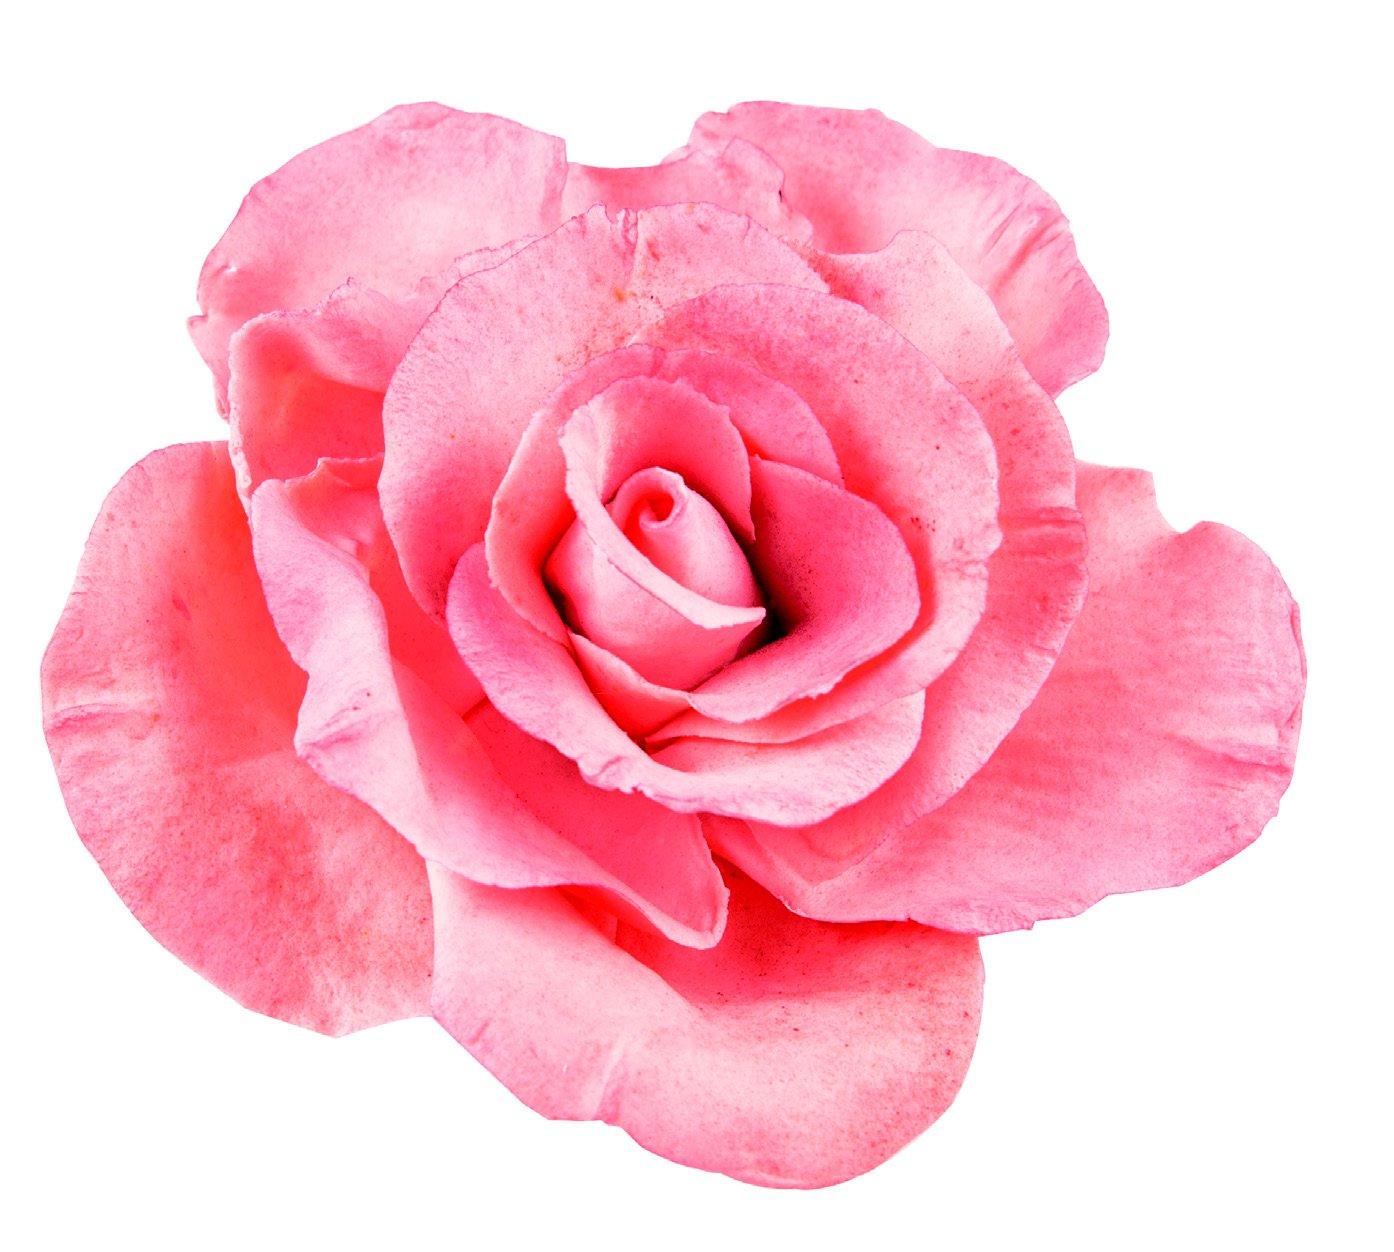 Silikomart Sugarflex Silicone Mold for Cake Decoration - Rose Petal